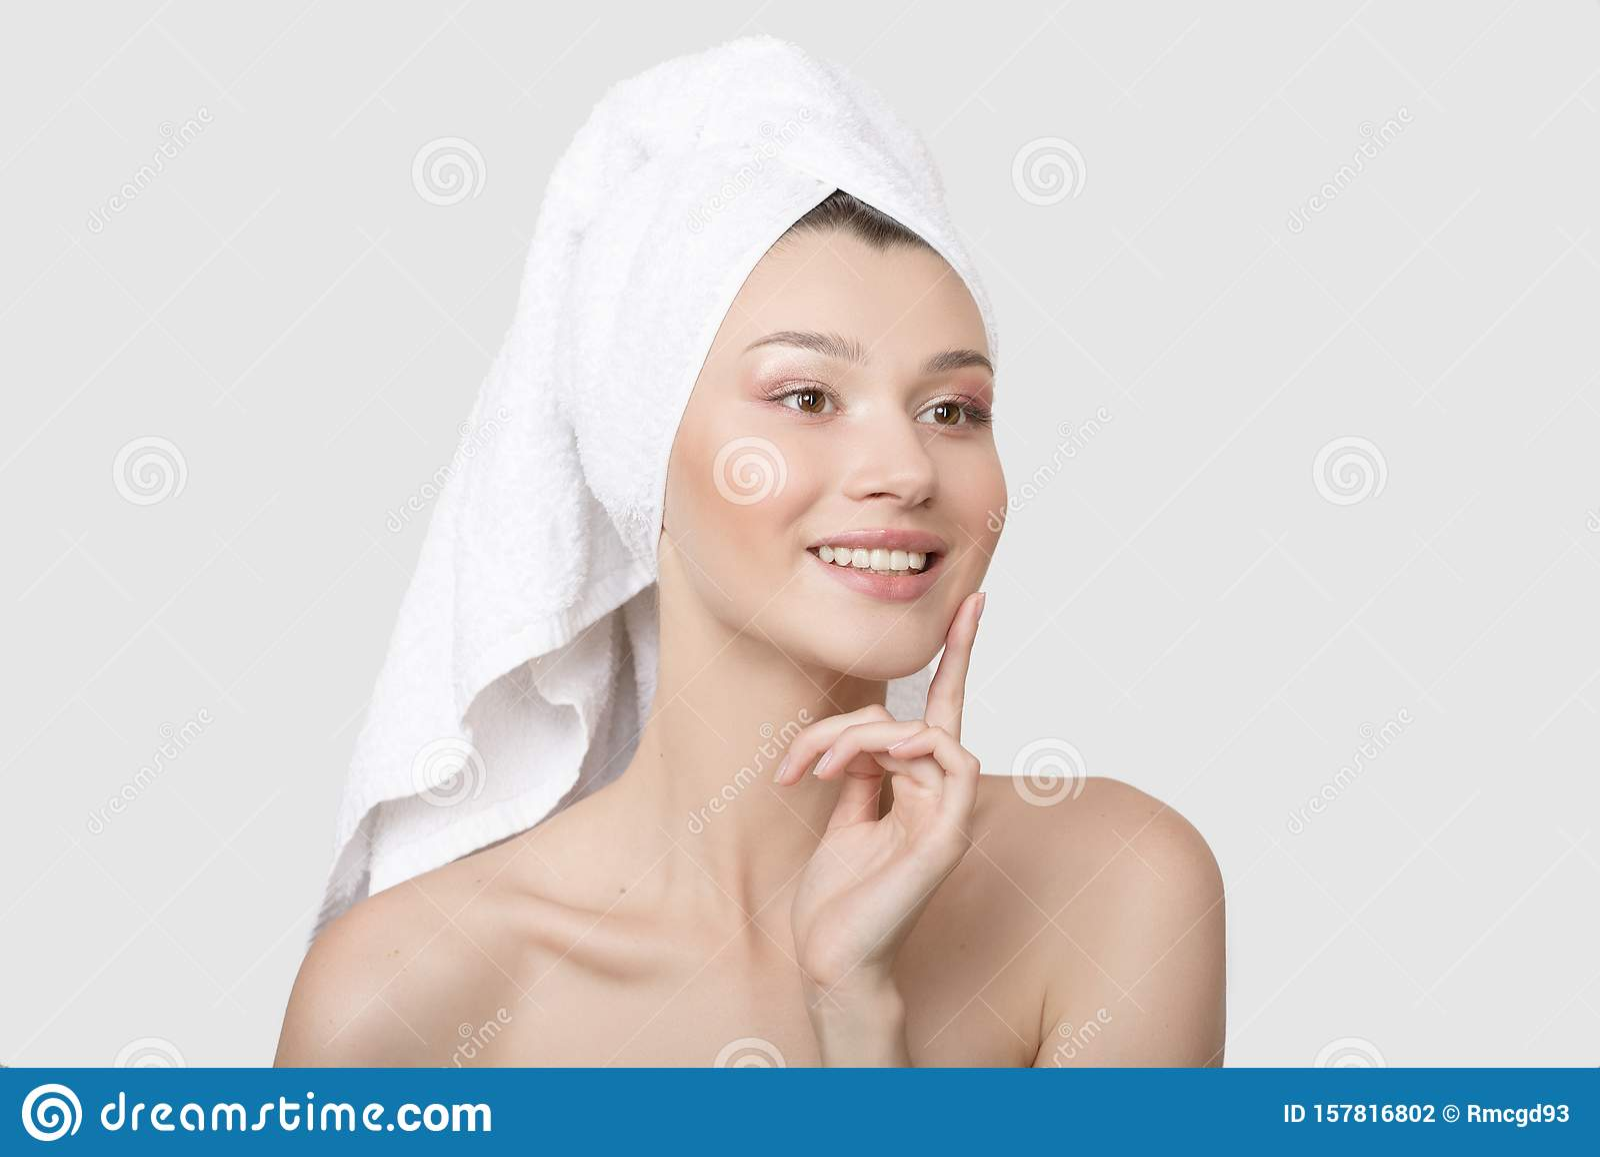 Smiling Naked Woman Holding Dental Floss Stock Image